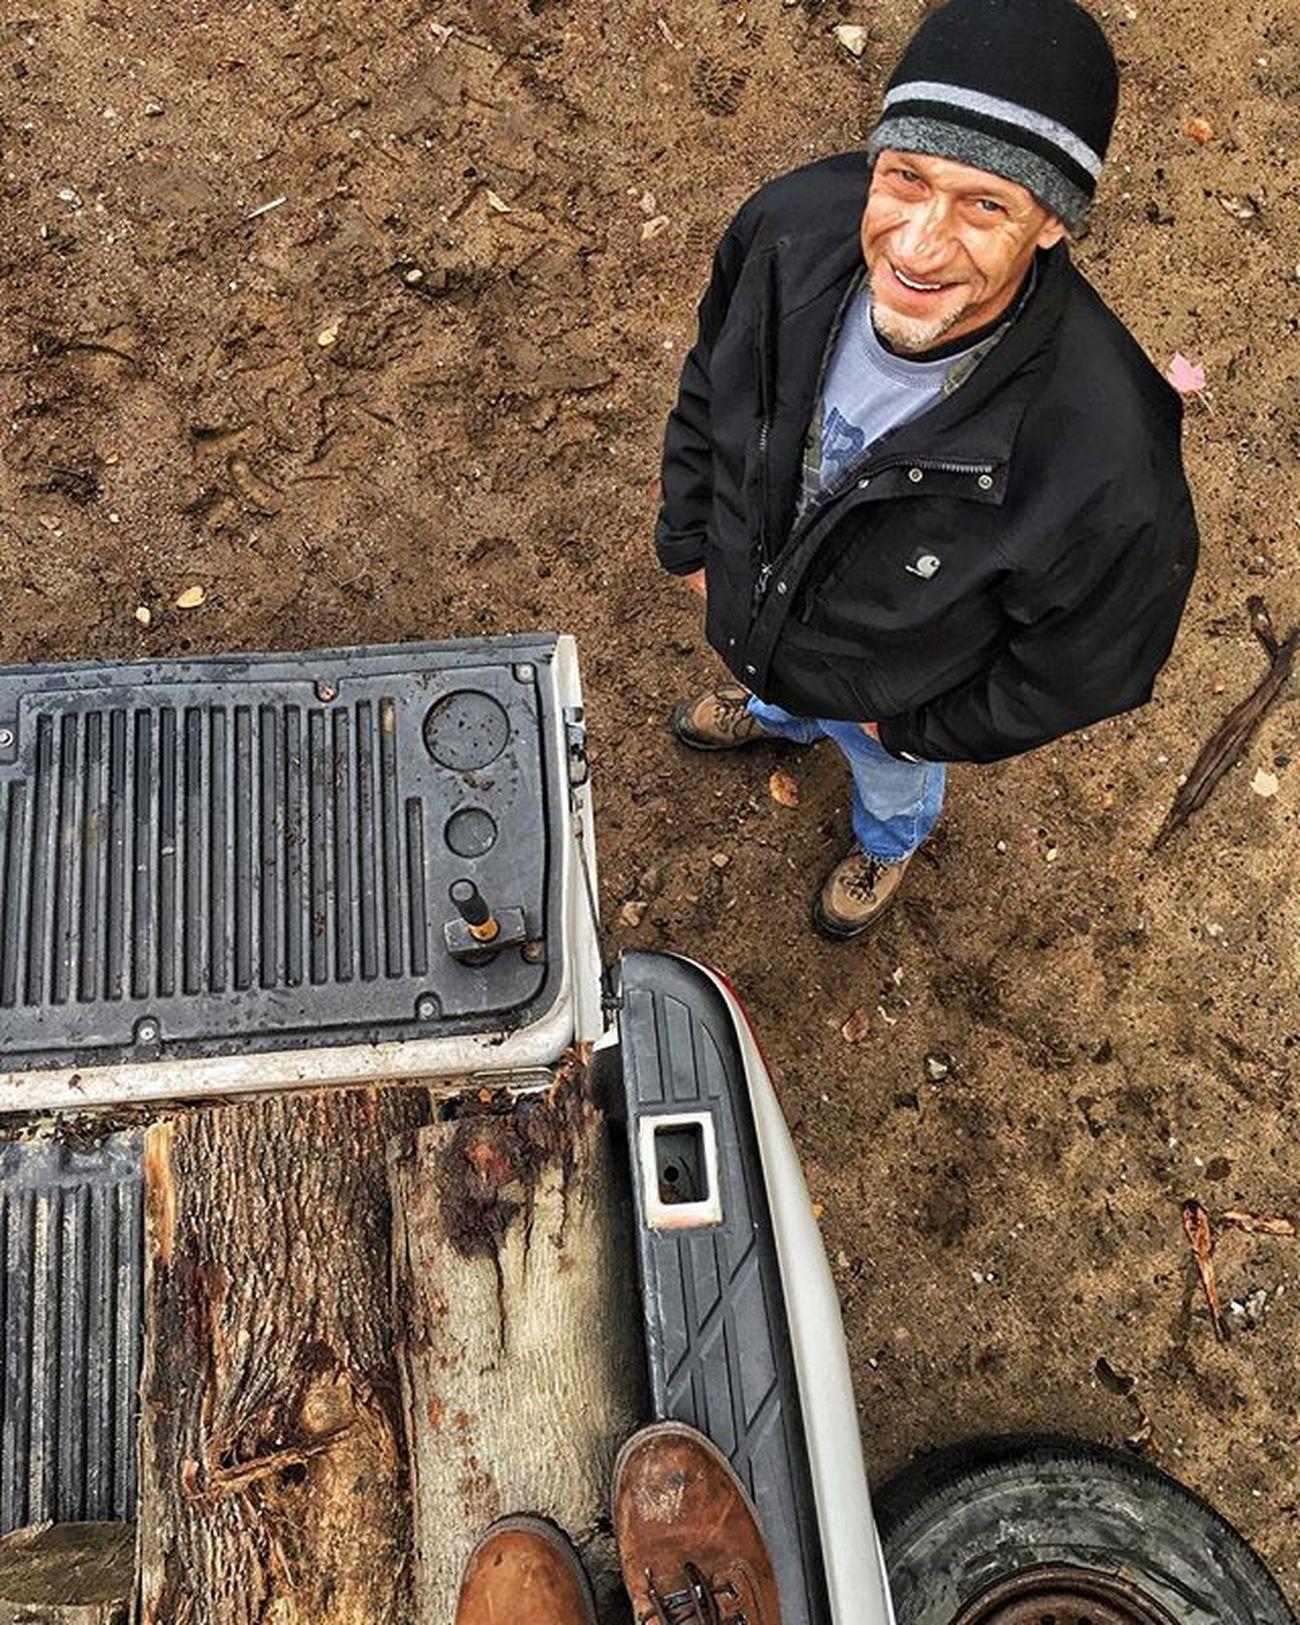 Stackin wood Adventure Explore Friday 2015  Fall ADK Adirondack Trees Wood Rustic Color Vscocam Snapseed Pixelpanda Photomasters Photooftheday Travel Upstateny Mountains